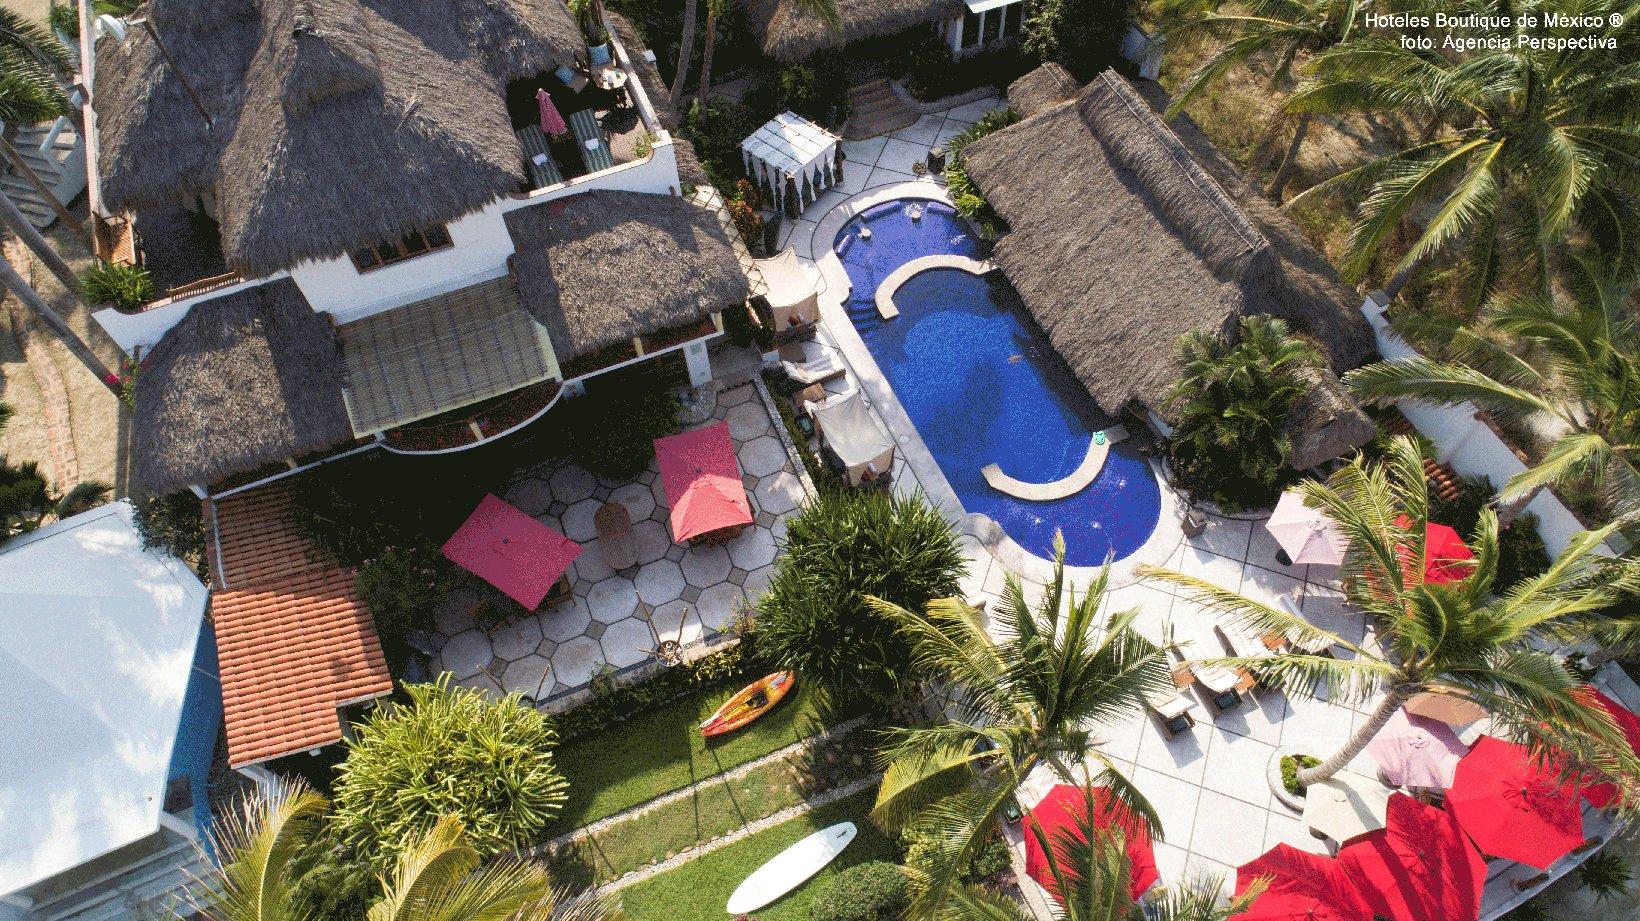 hoteles-boutique-de-mexico-hotel-casa-de-mita